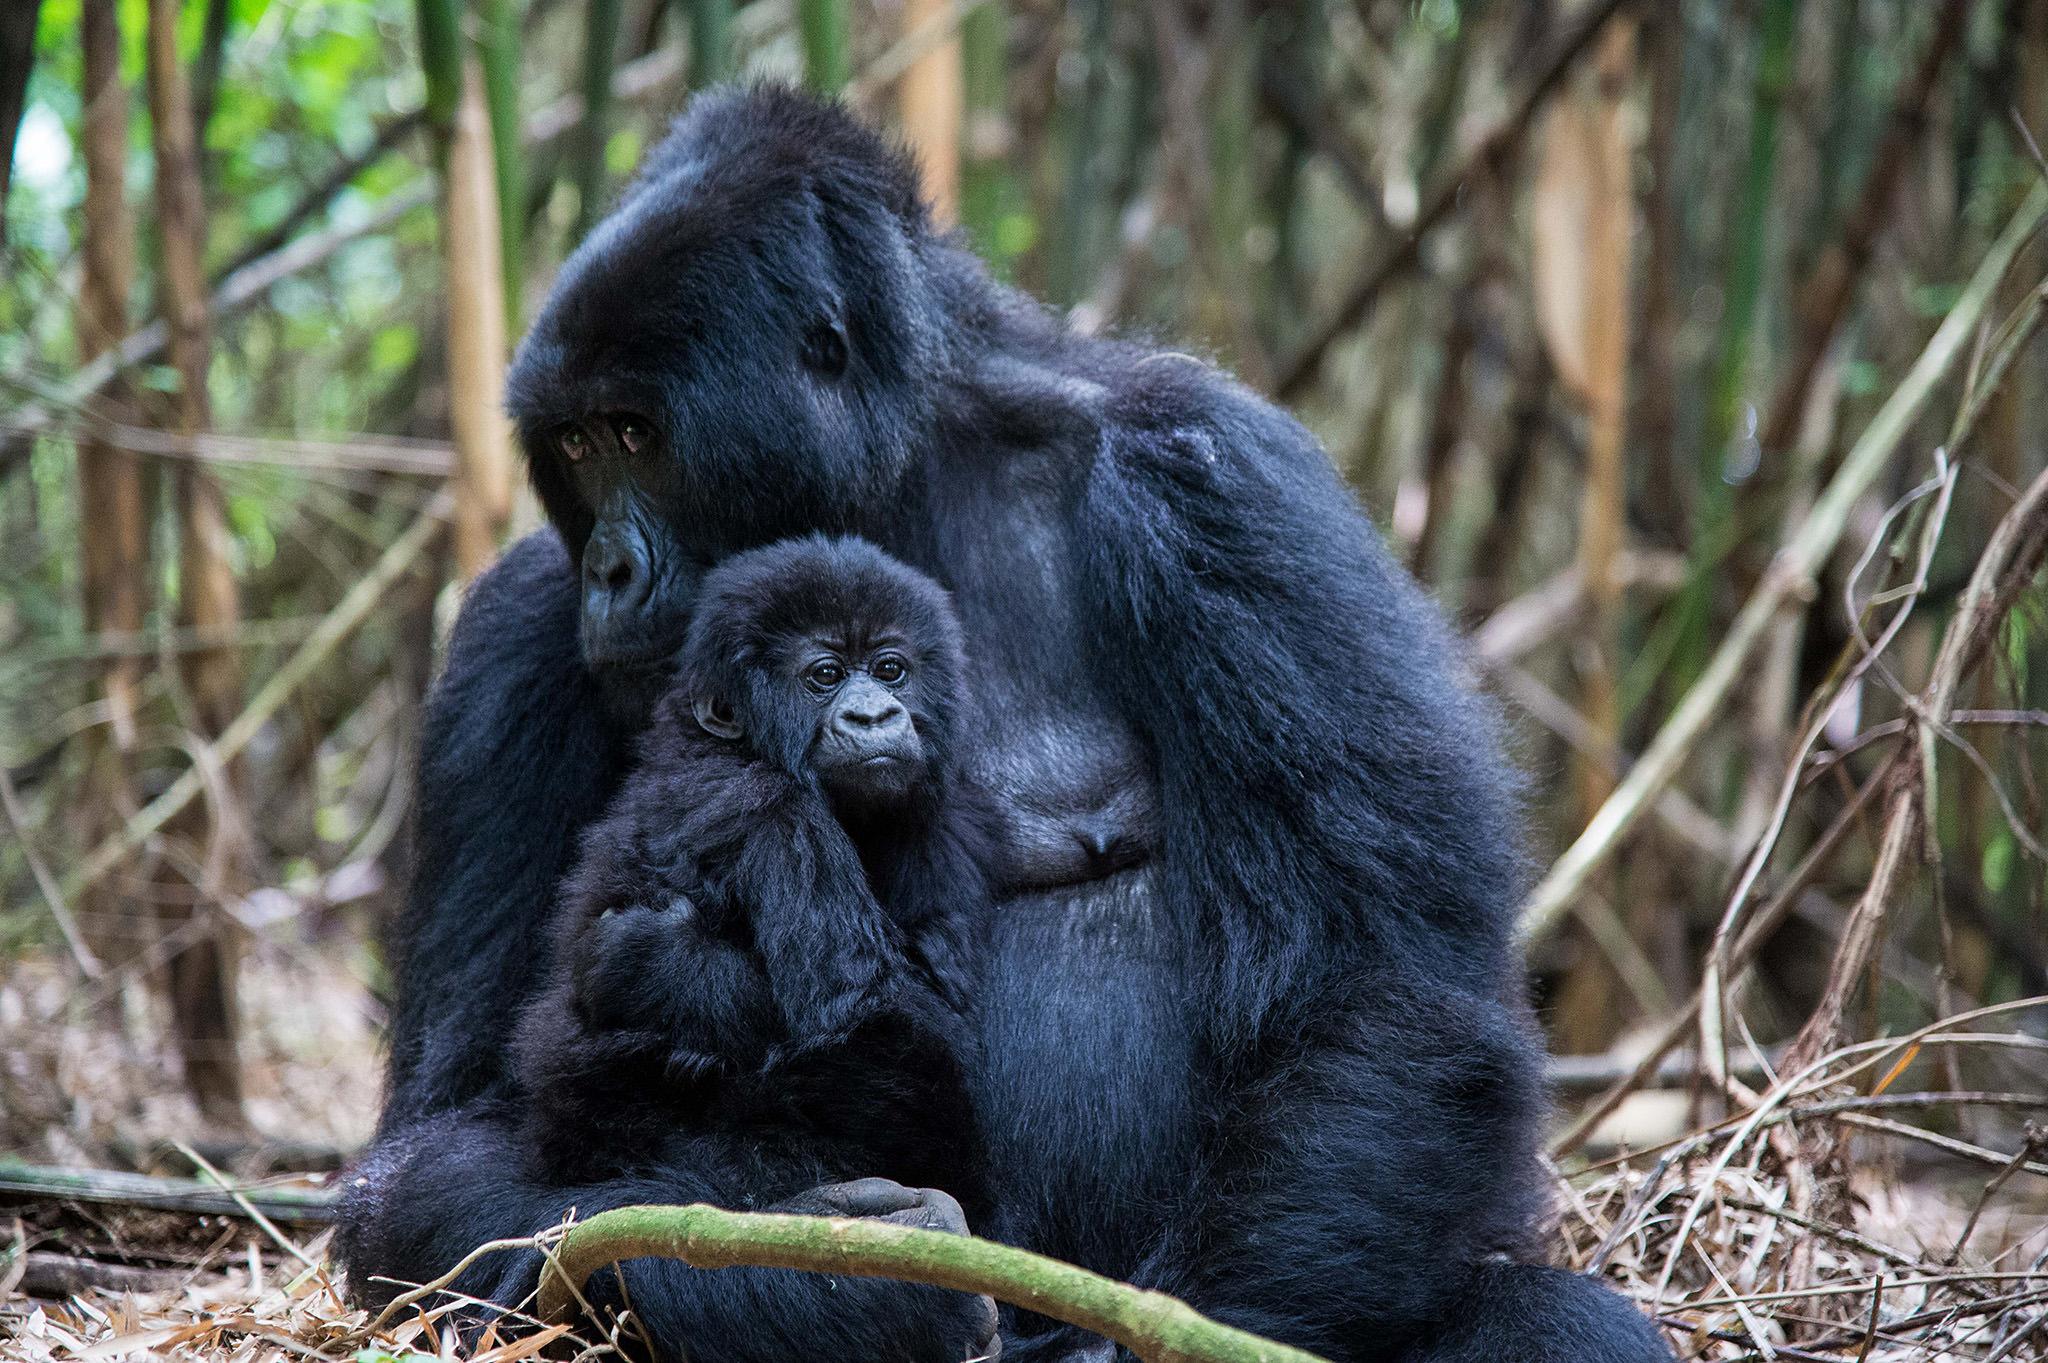 Gorilla-Photography-10.jpg